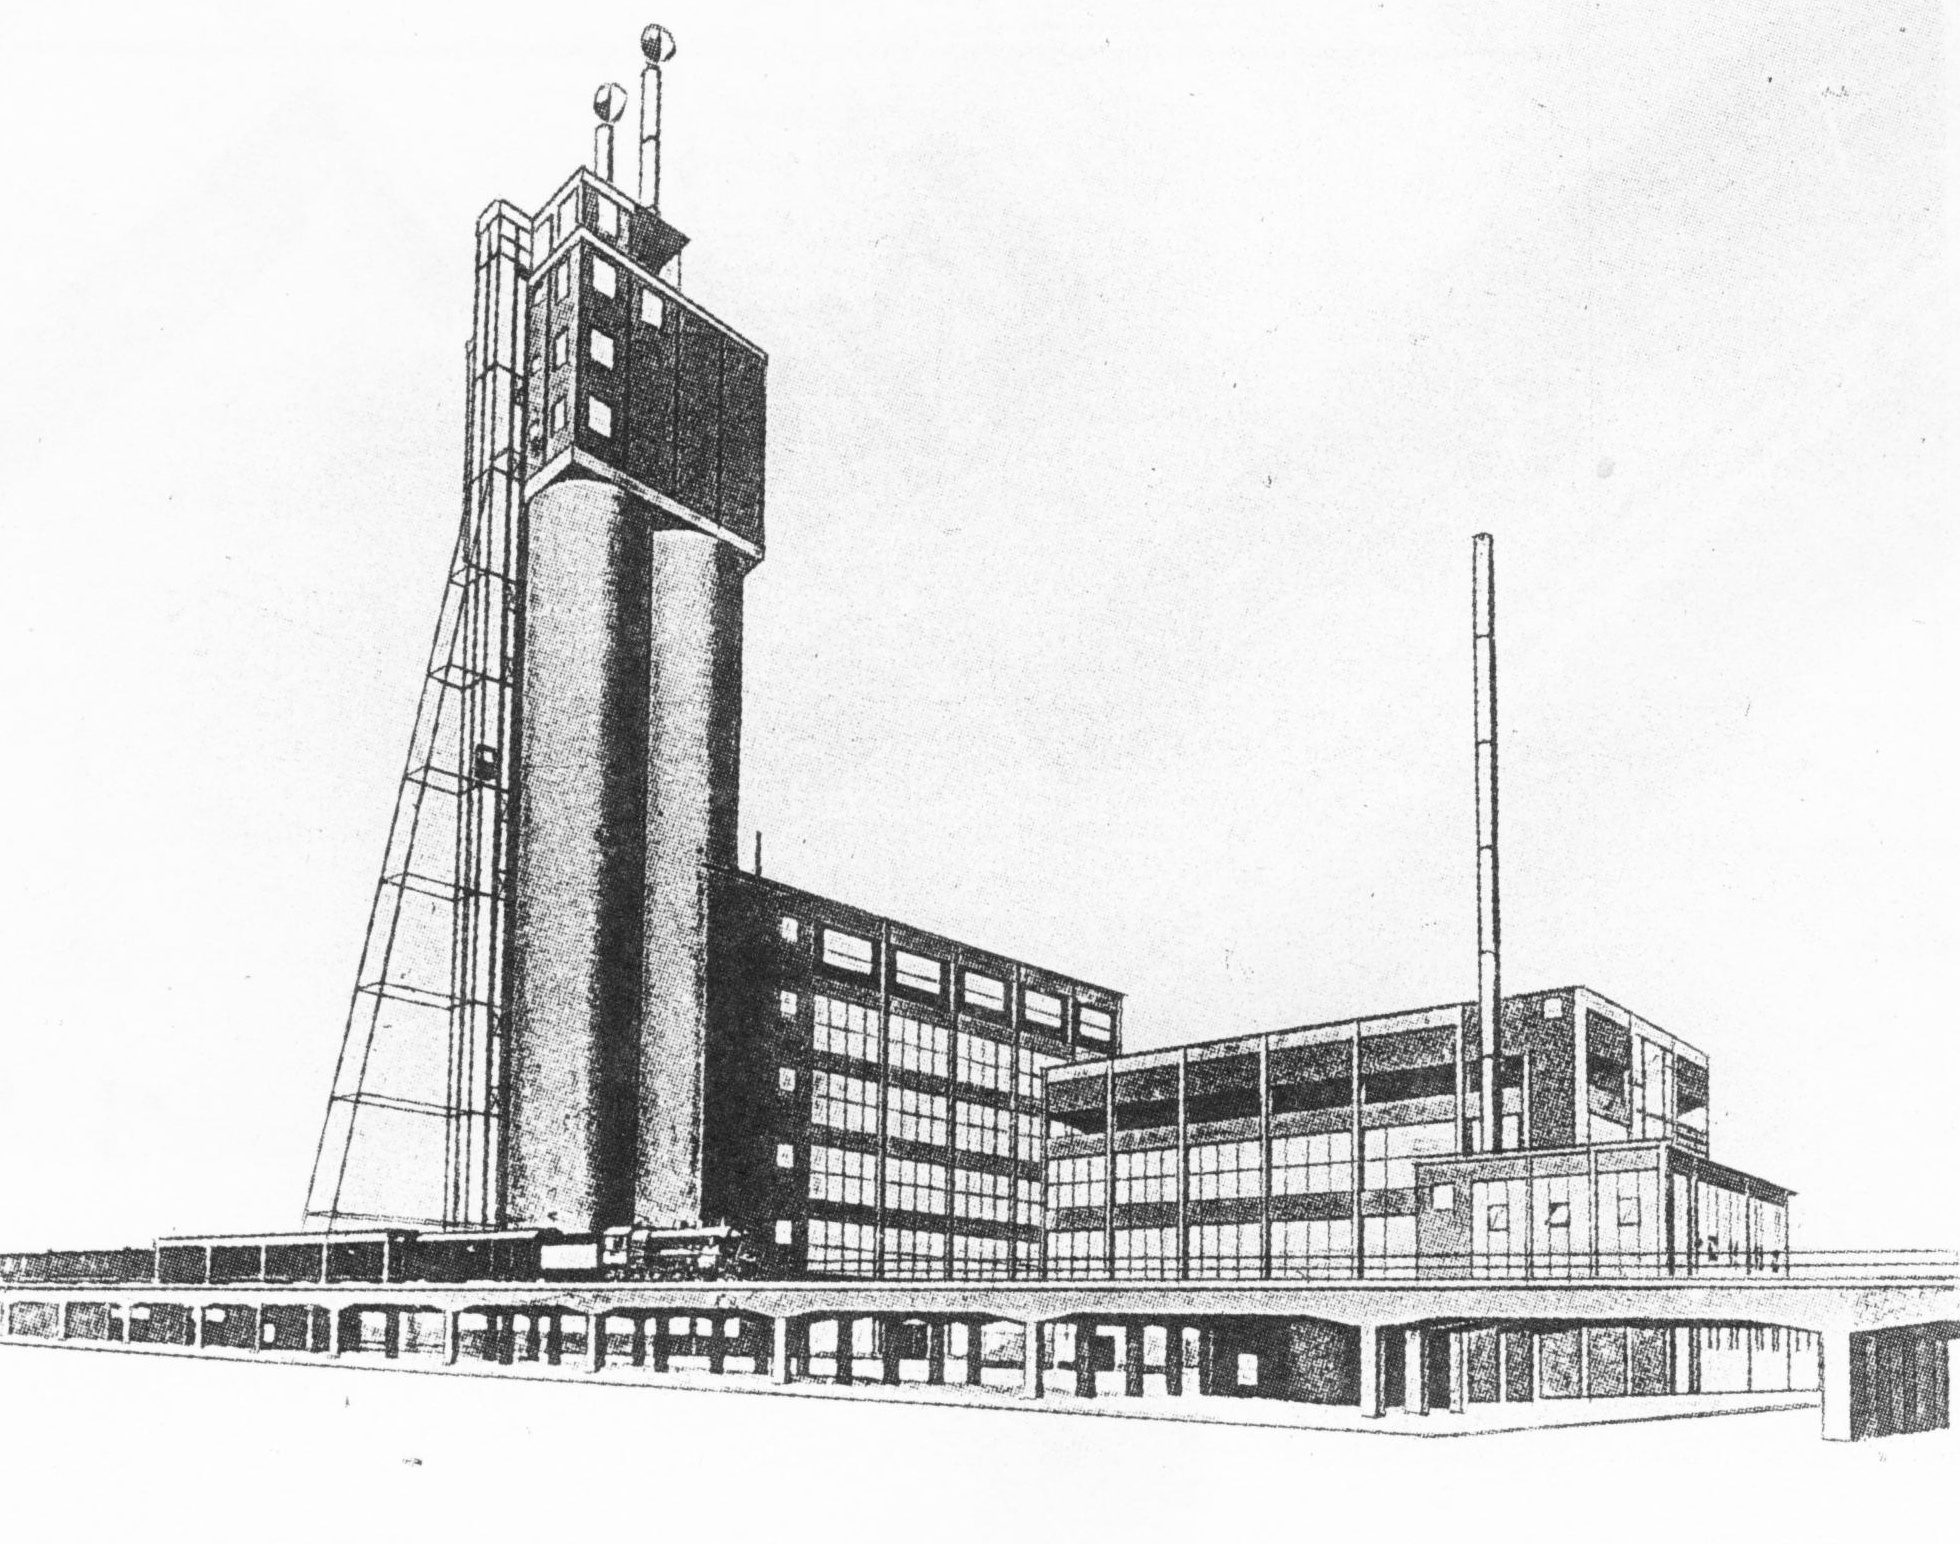 I. Sobolev, studio of Aleksandr Vesnin, perspective view of a bread factory (bread combine), 1925